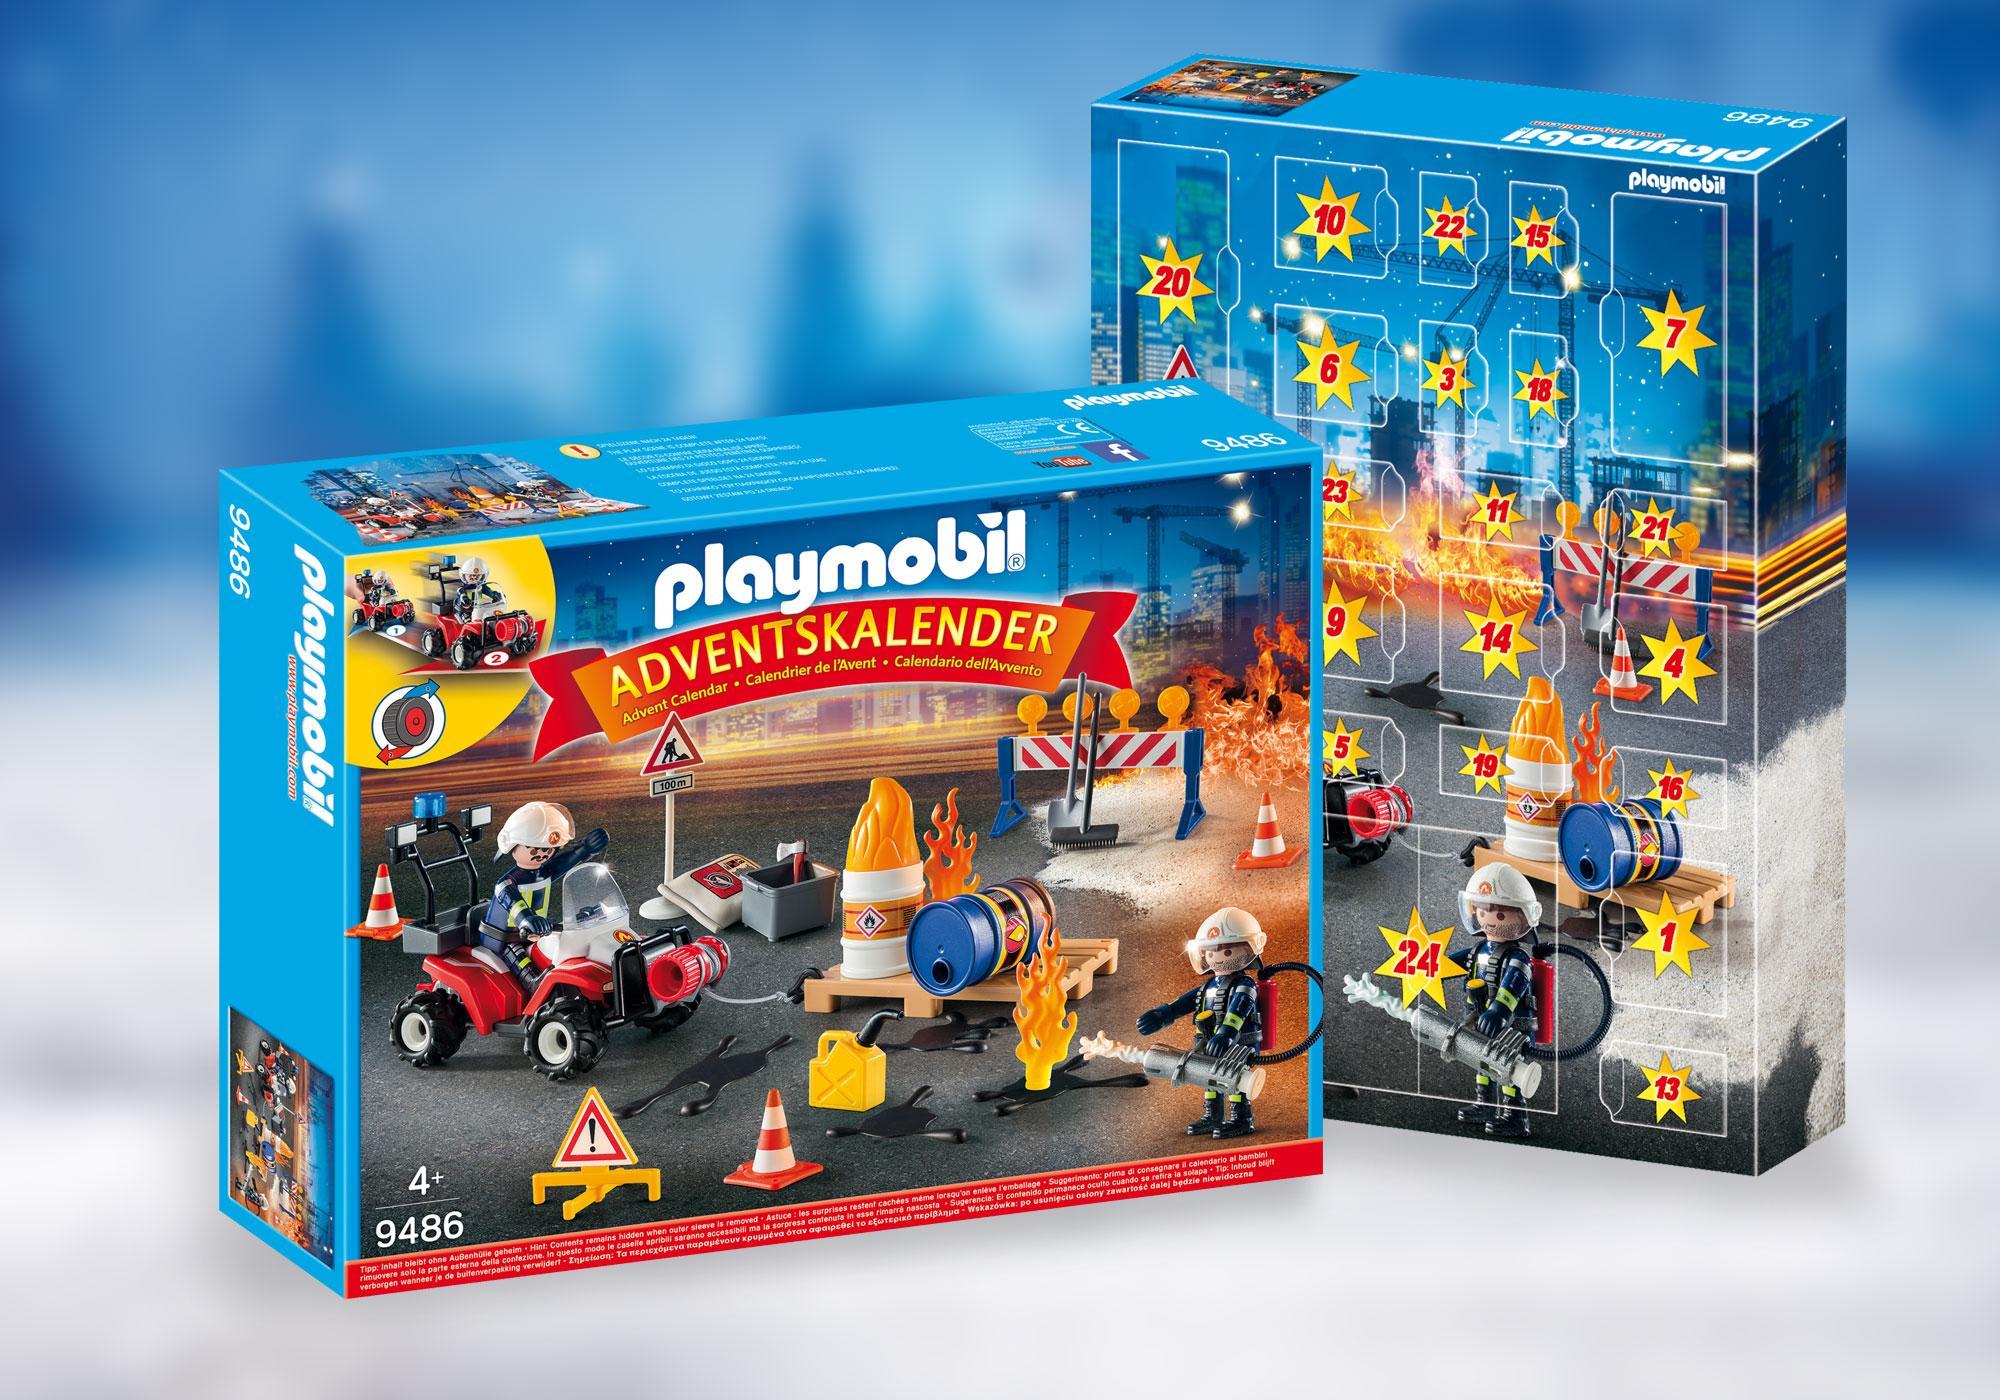 http://media.playmobil.com/i/playmobil/9486_product_detail